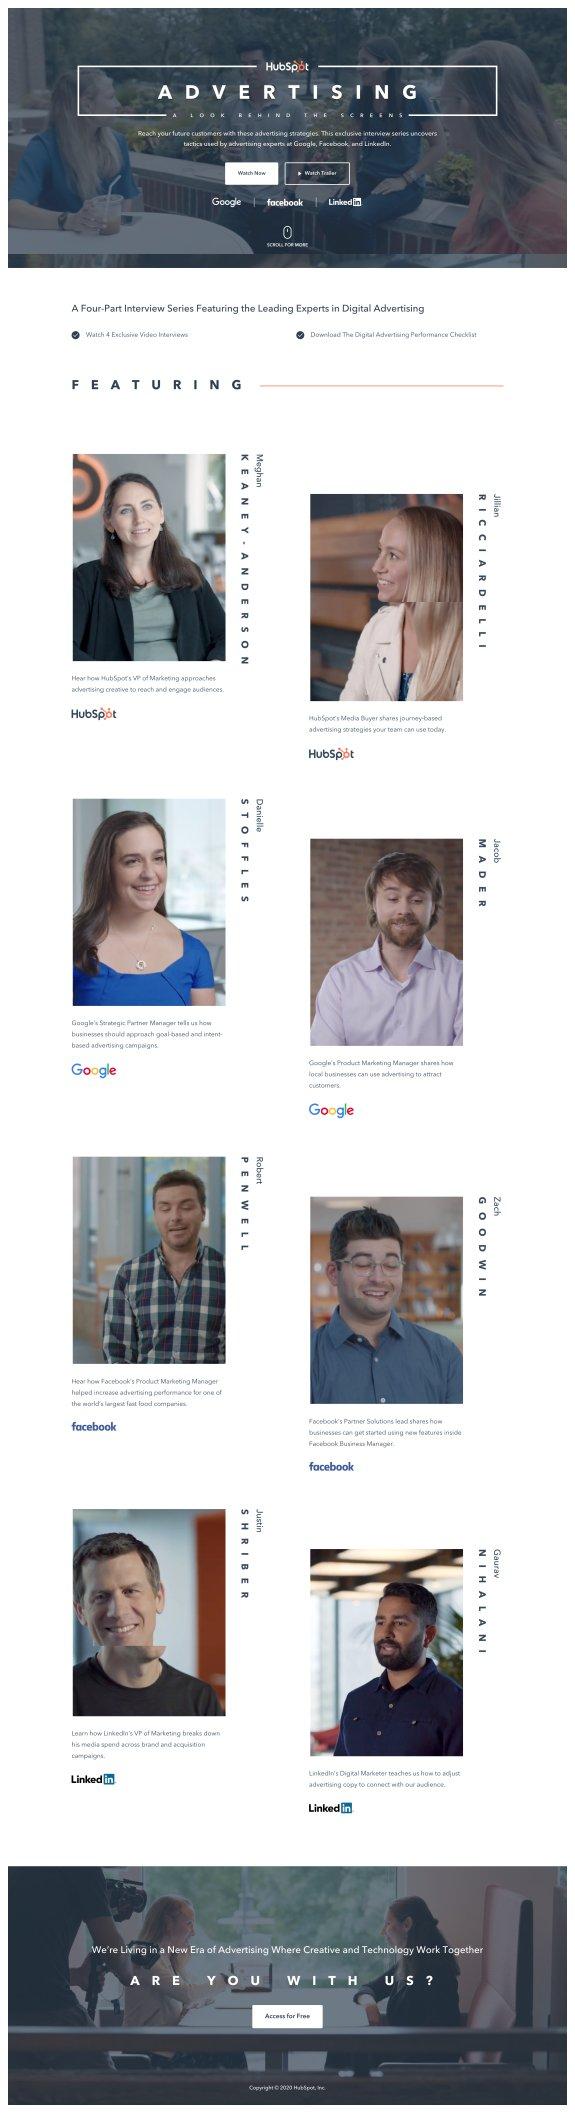 Example of HubSpot's Webinar Landing Page